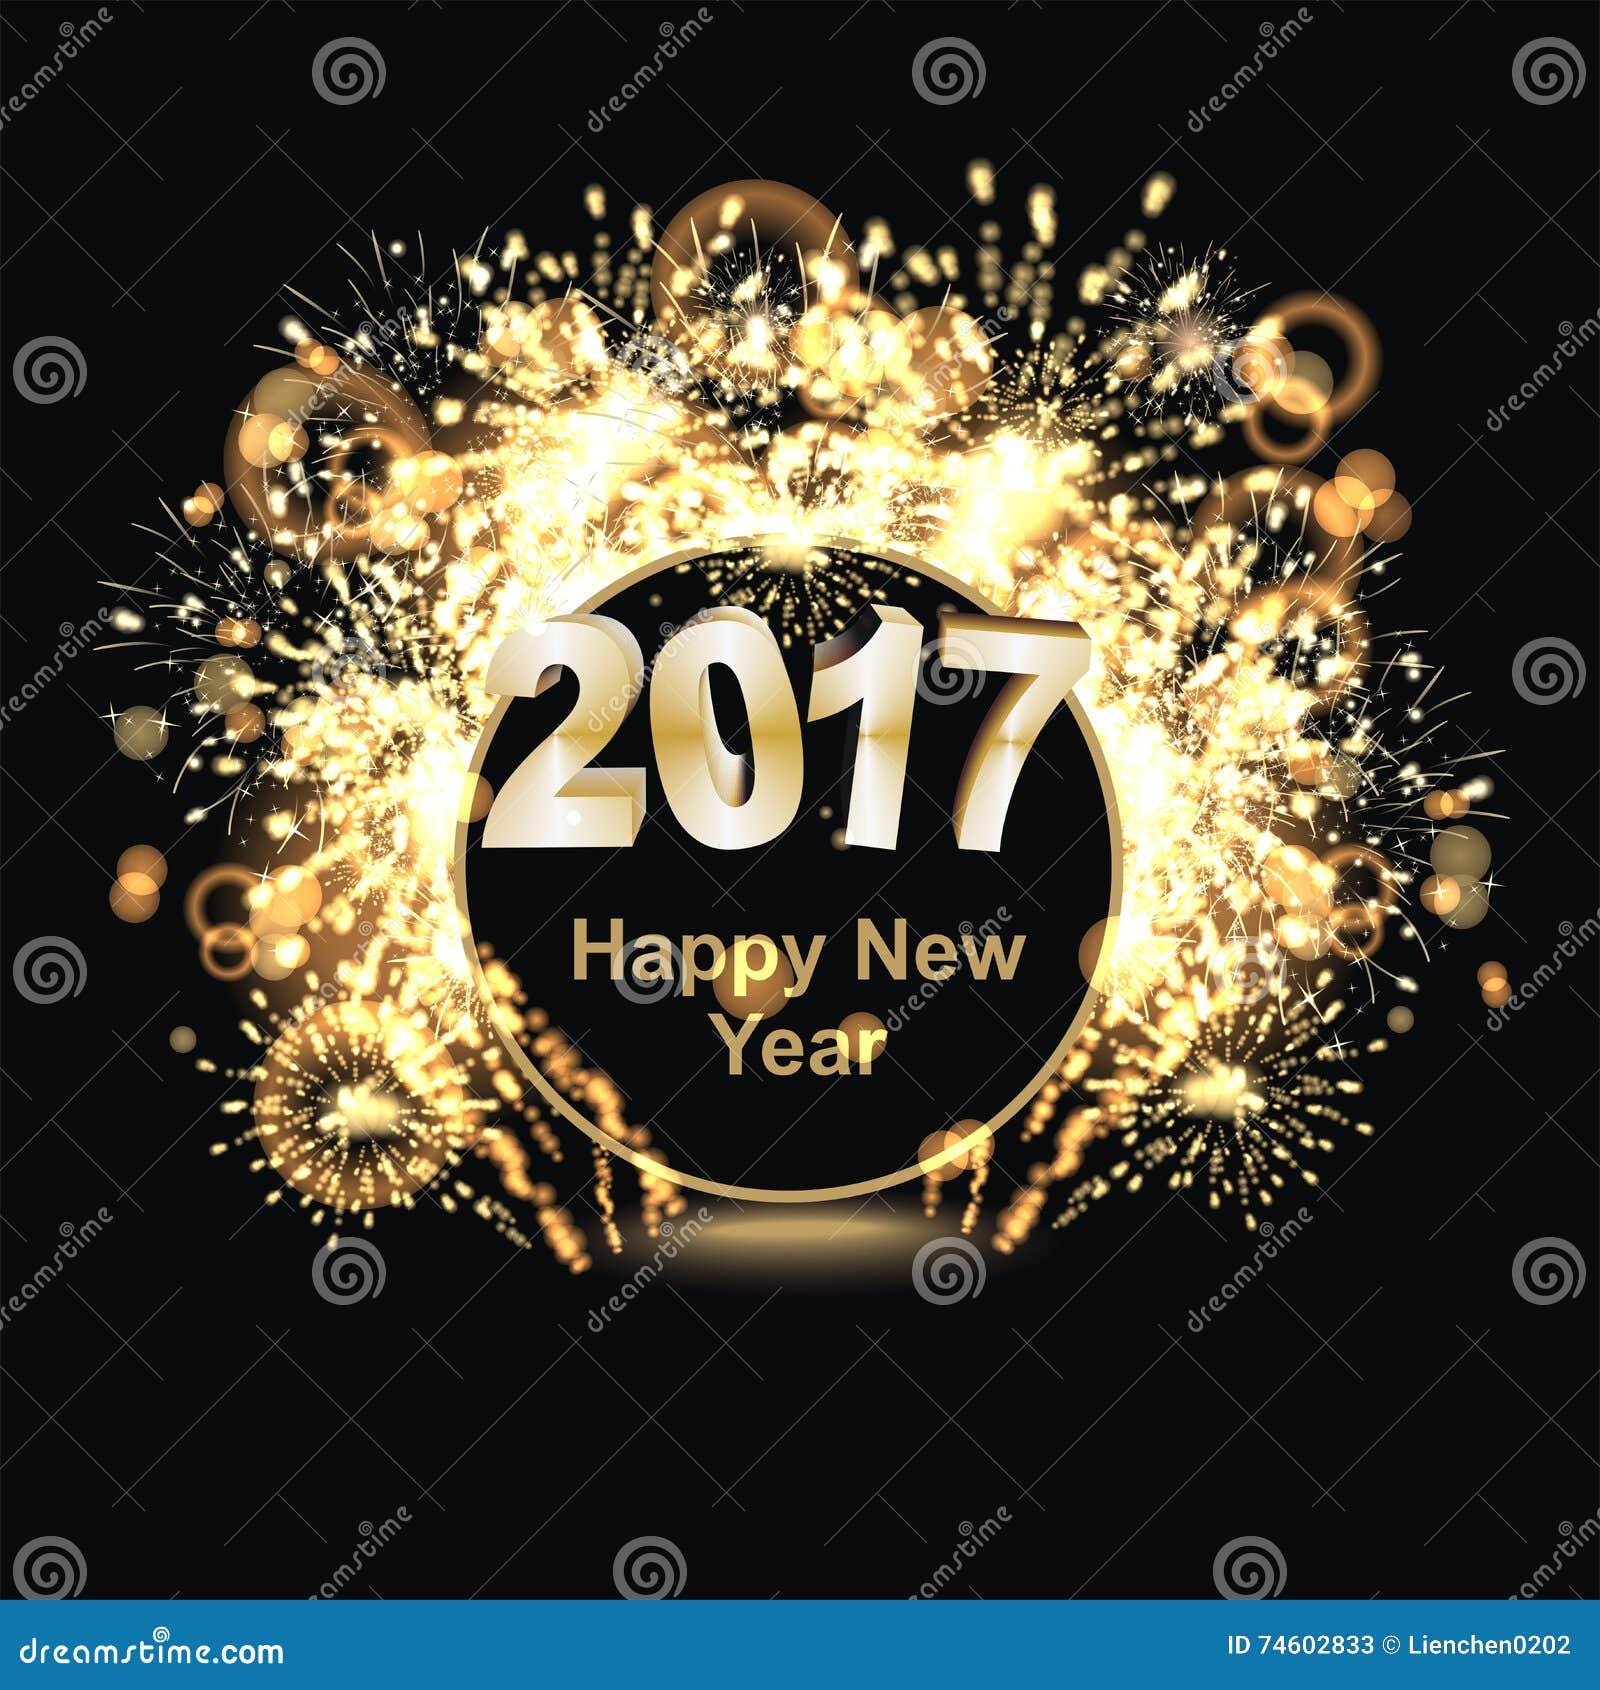 Happy New Year 2017 stock illustration. Image of golden ...